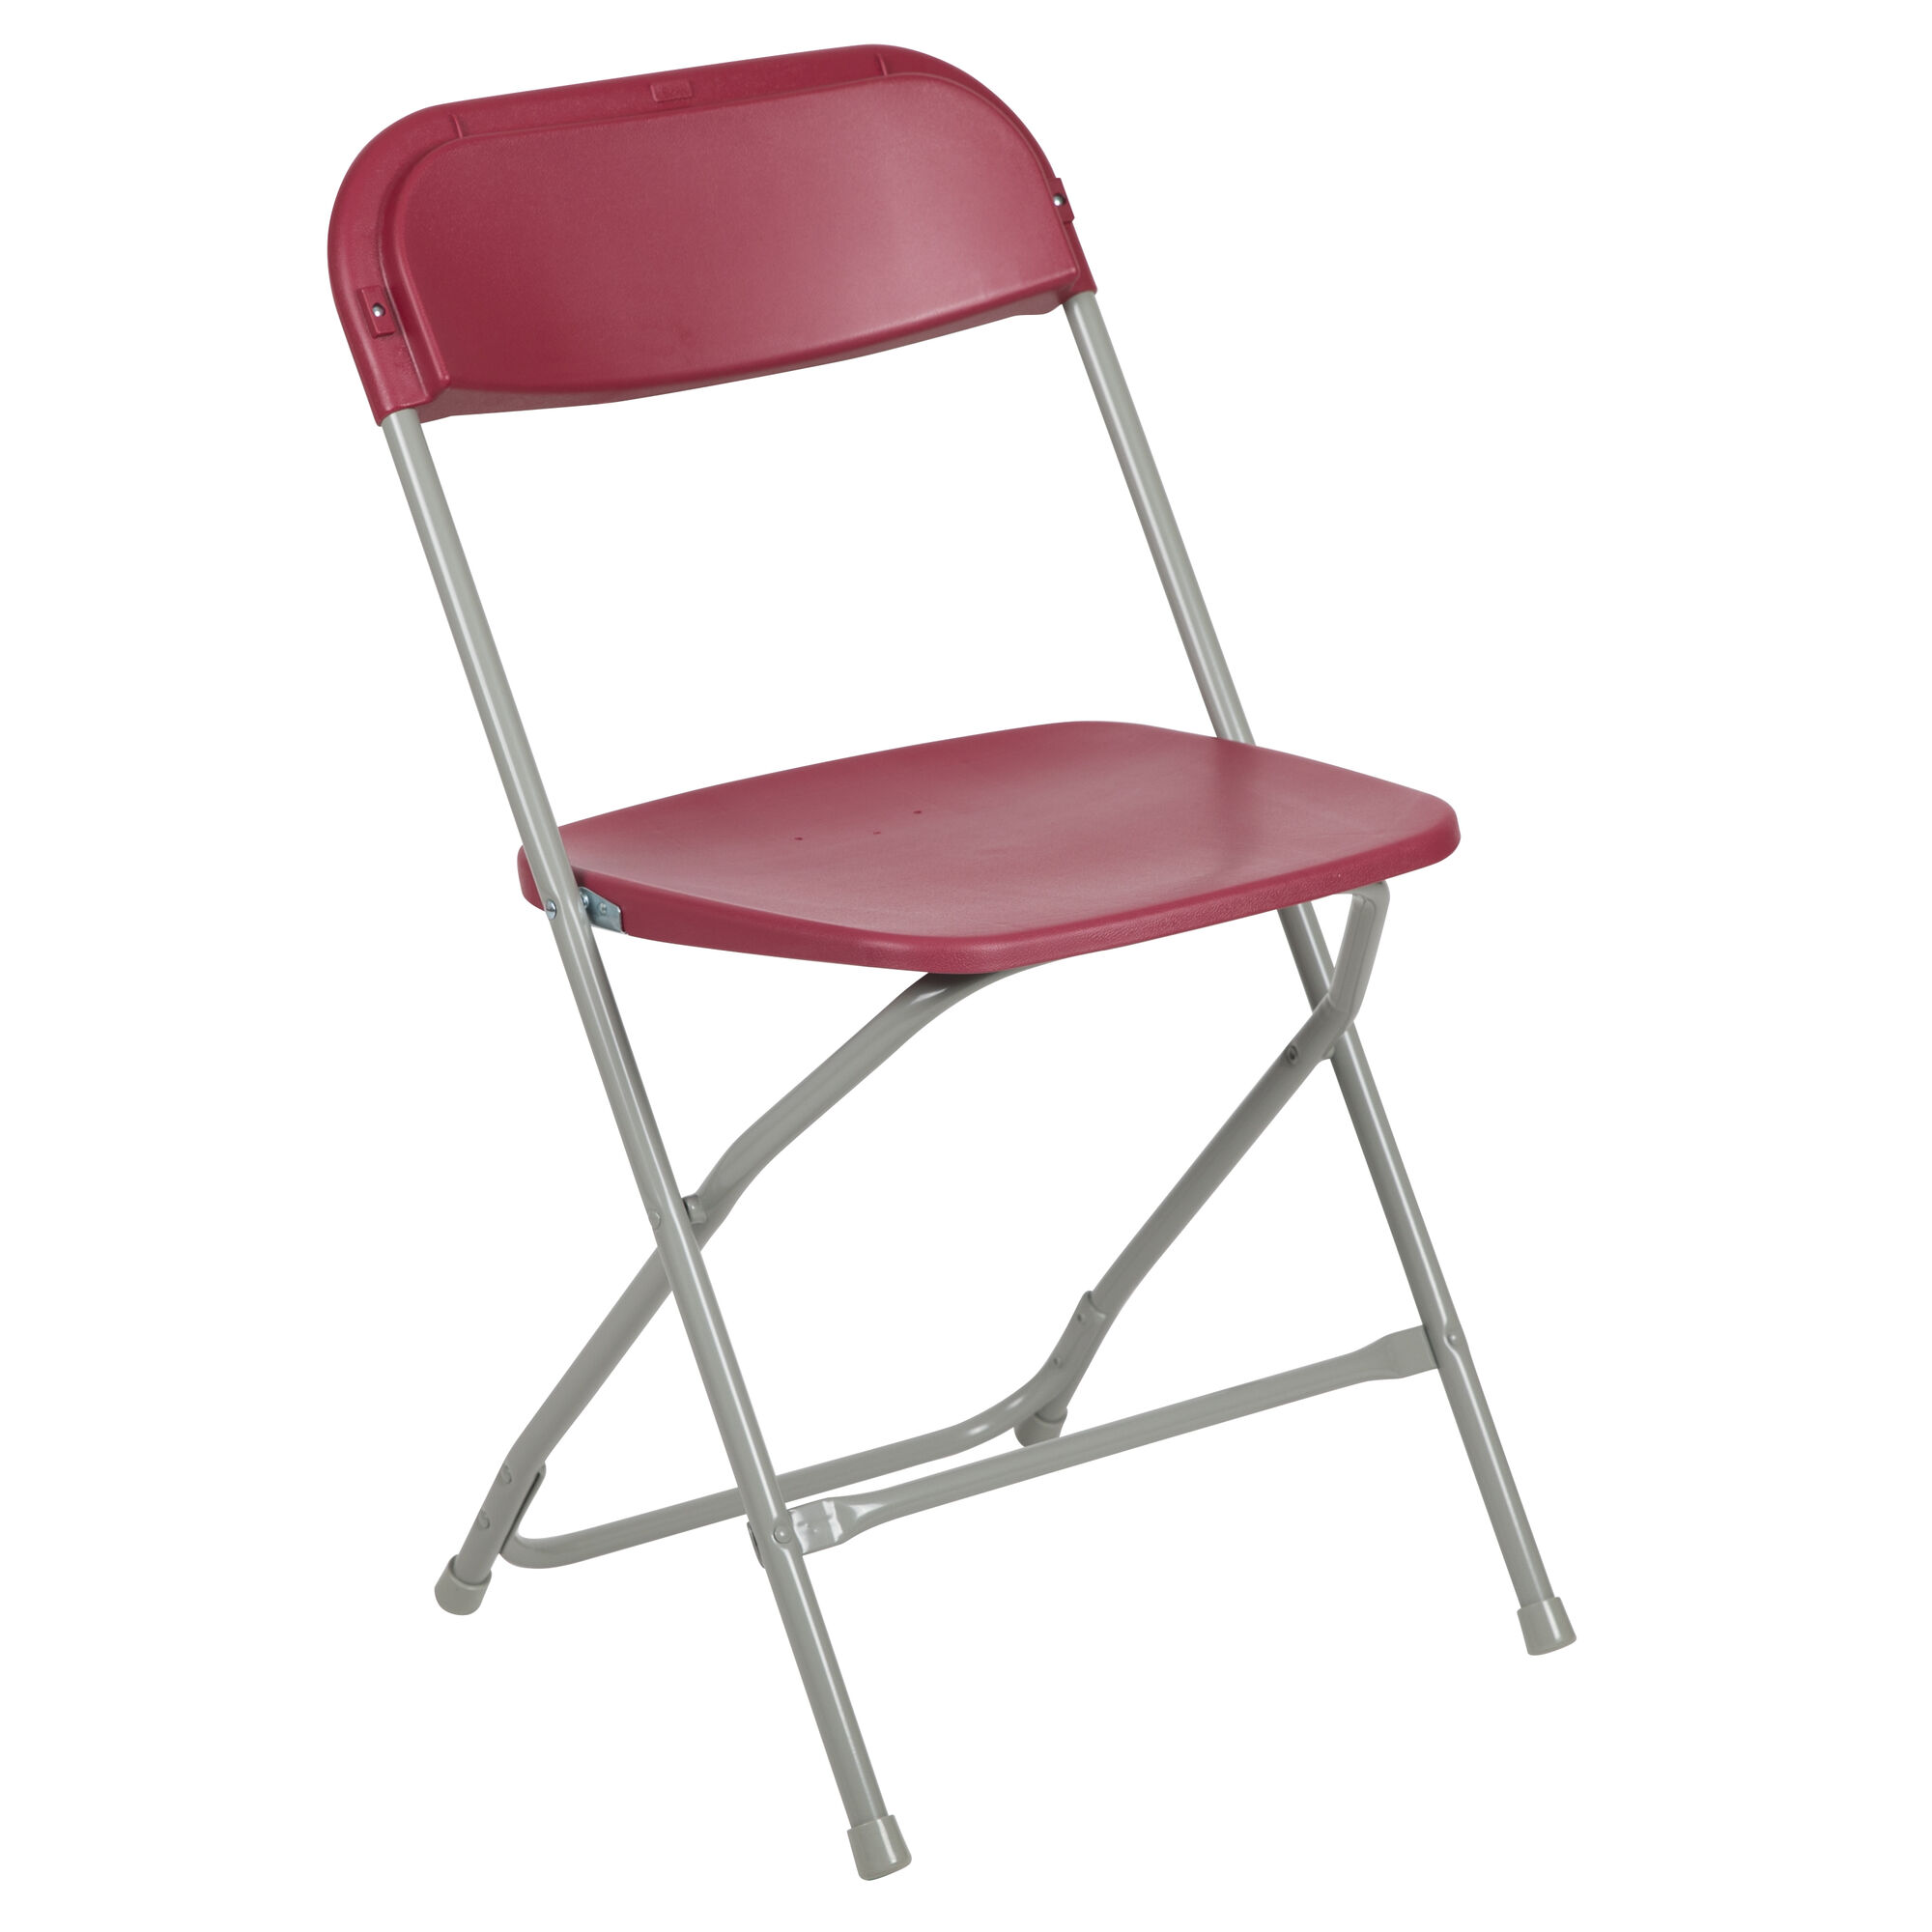 FoldingChairs4Less Folding Chairs